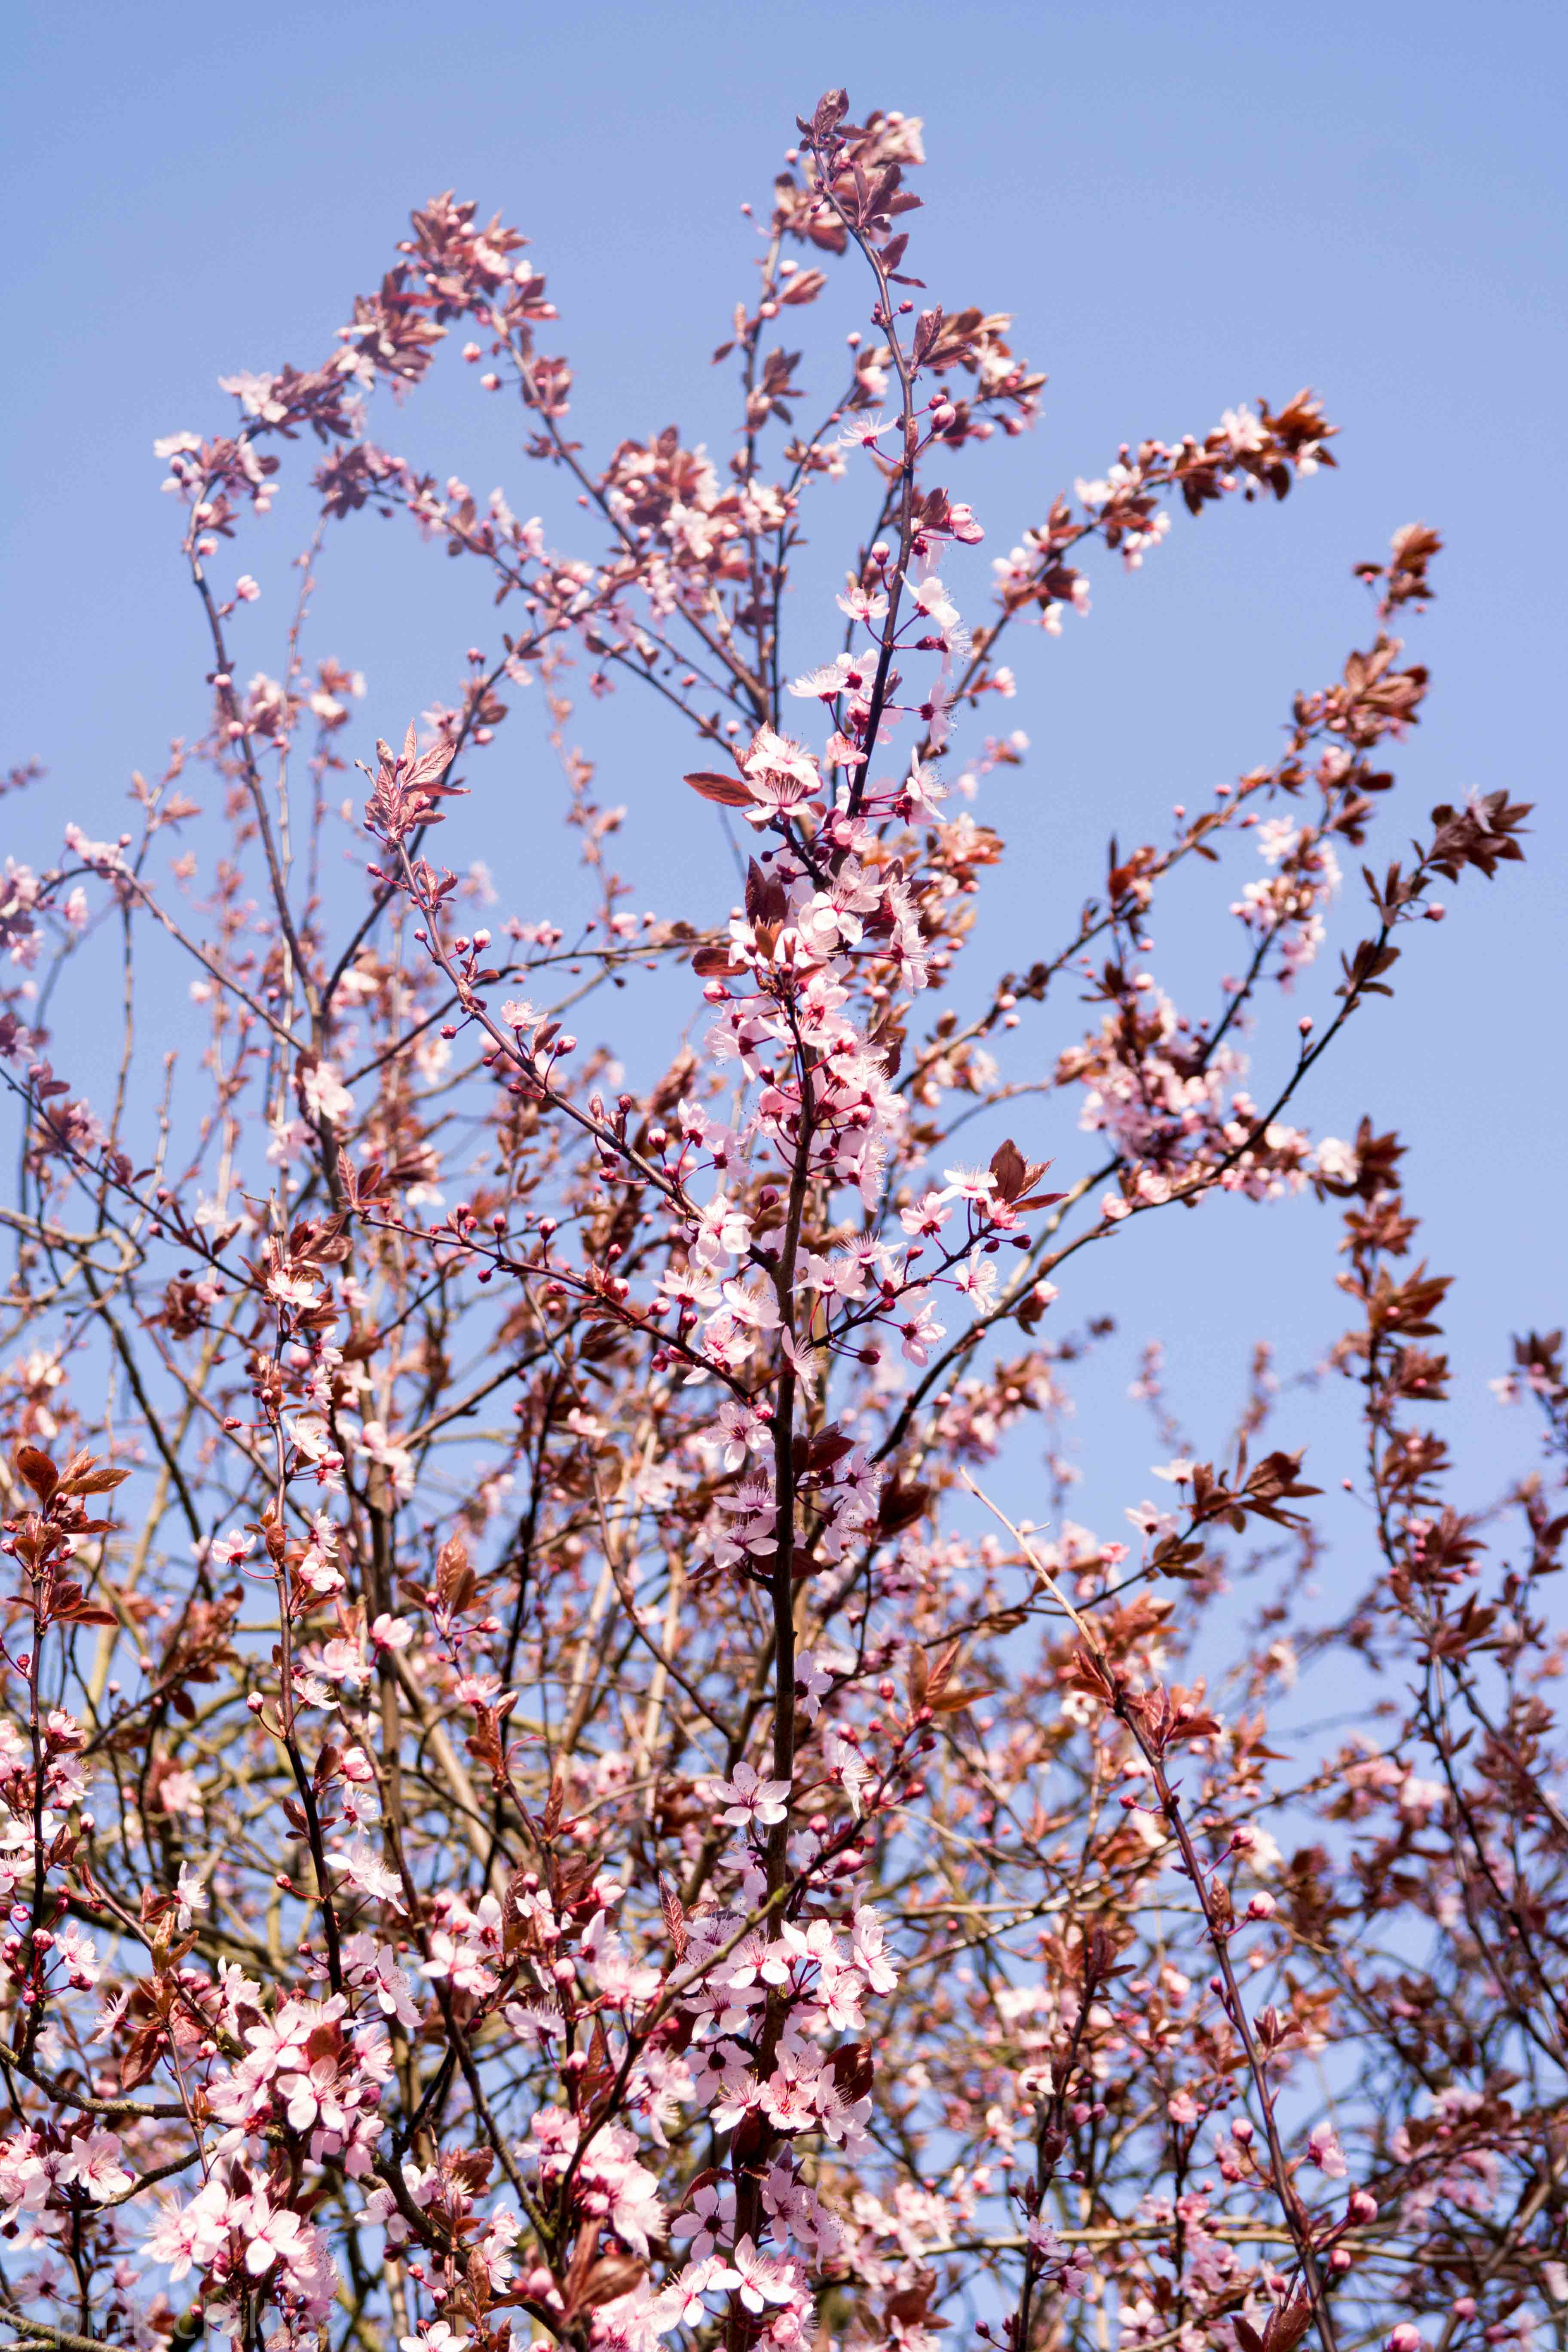 rosa blühende Bäume